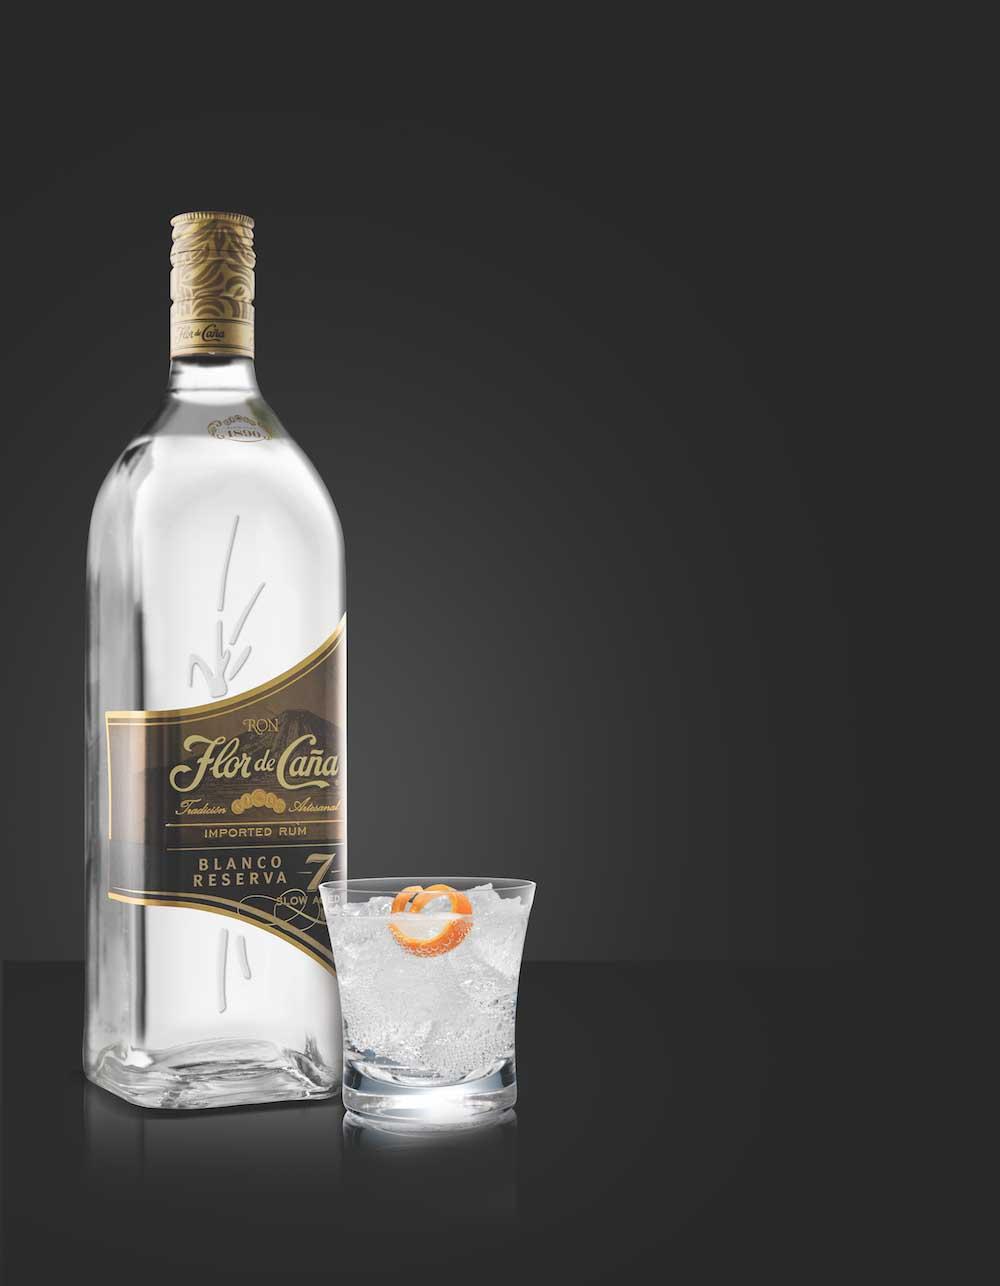 Flor de Caña uvádí světový unikát: sedmiletý bílý rum Blanco Reserva